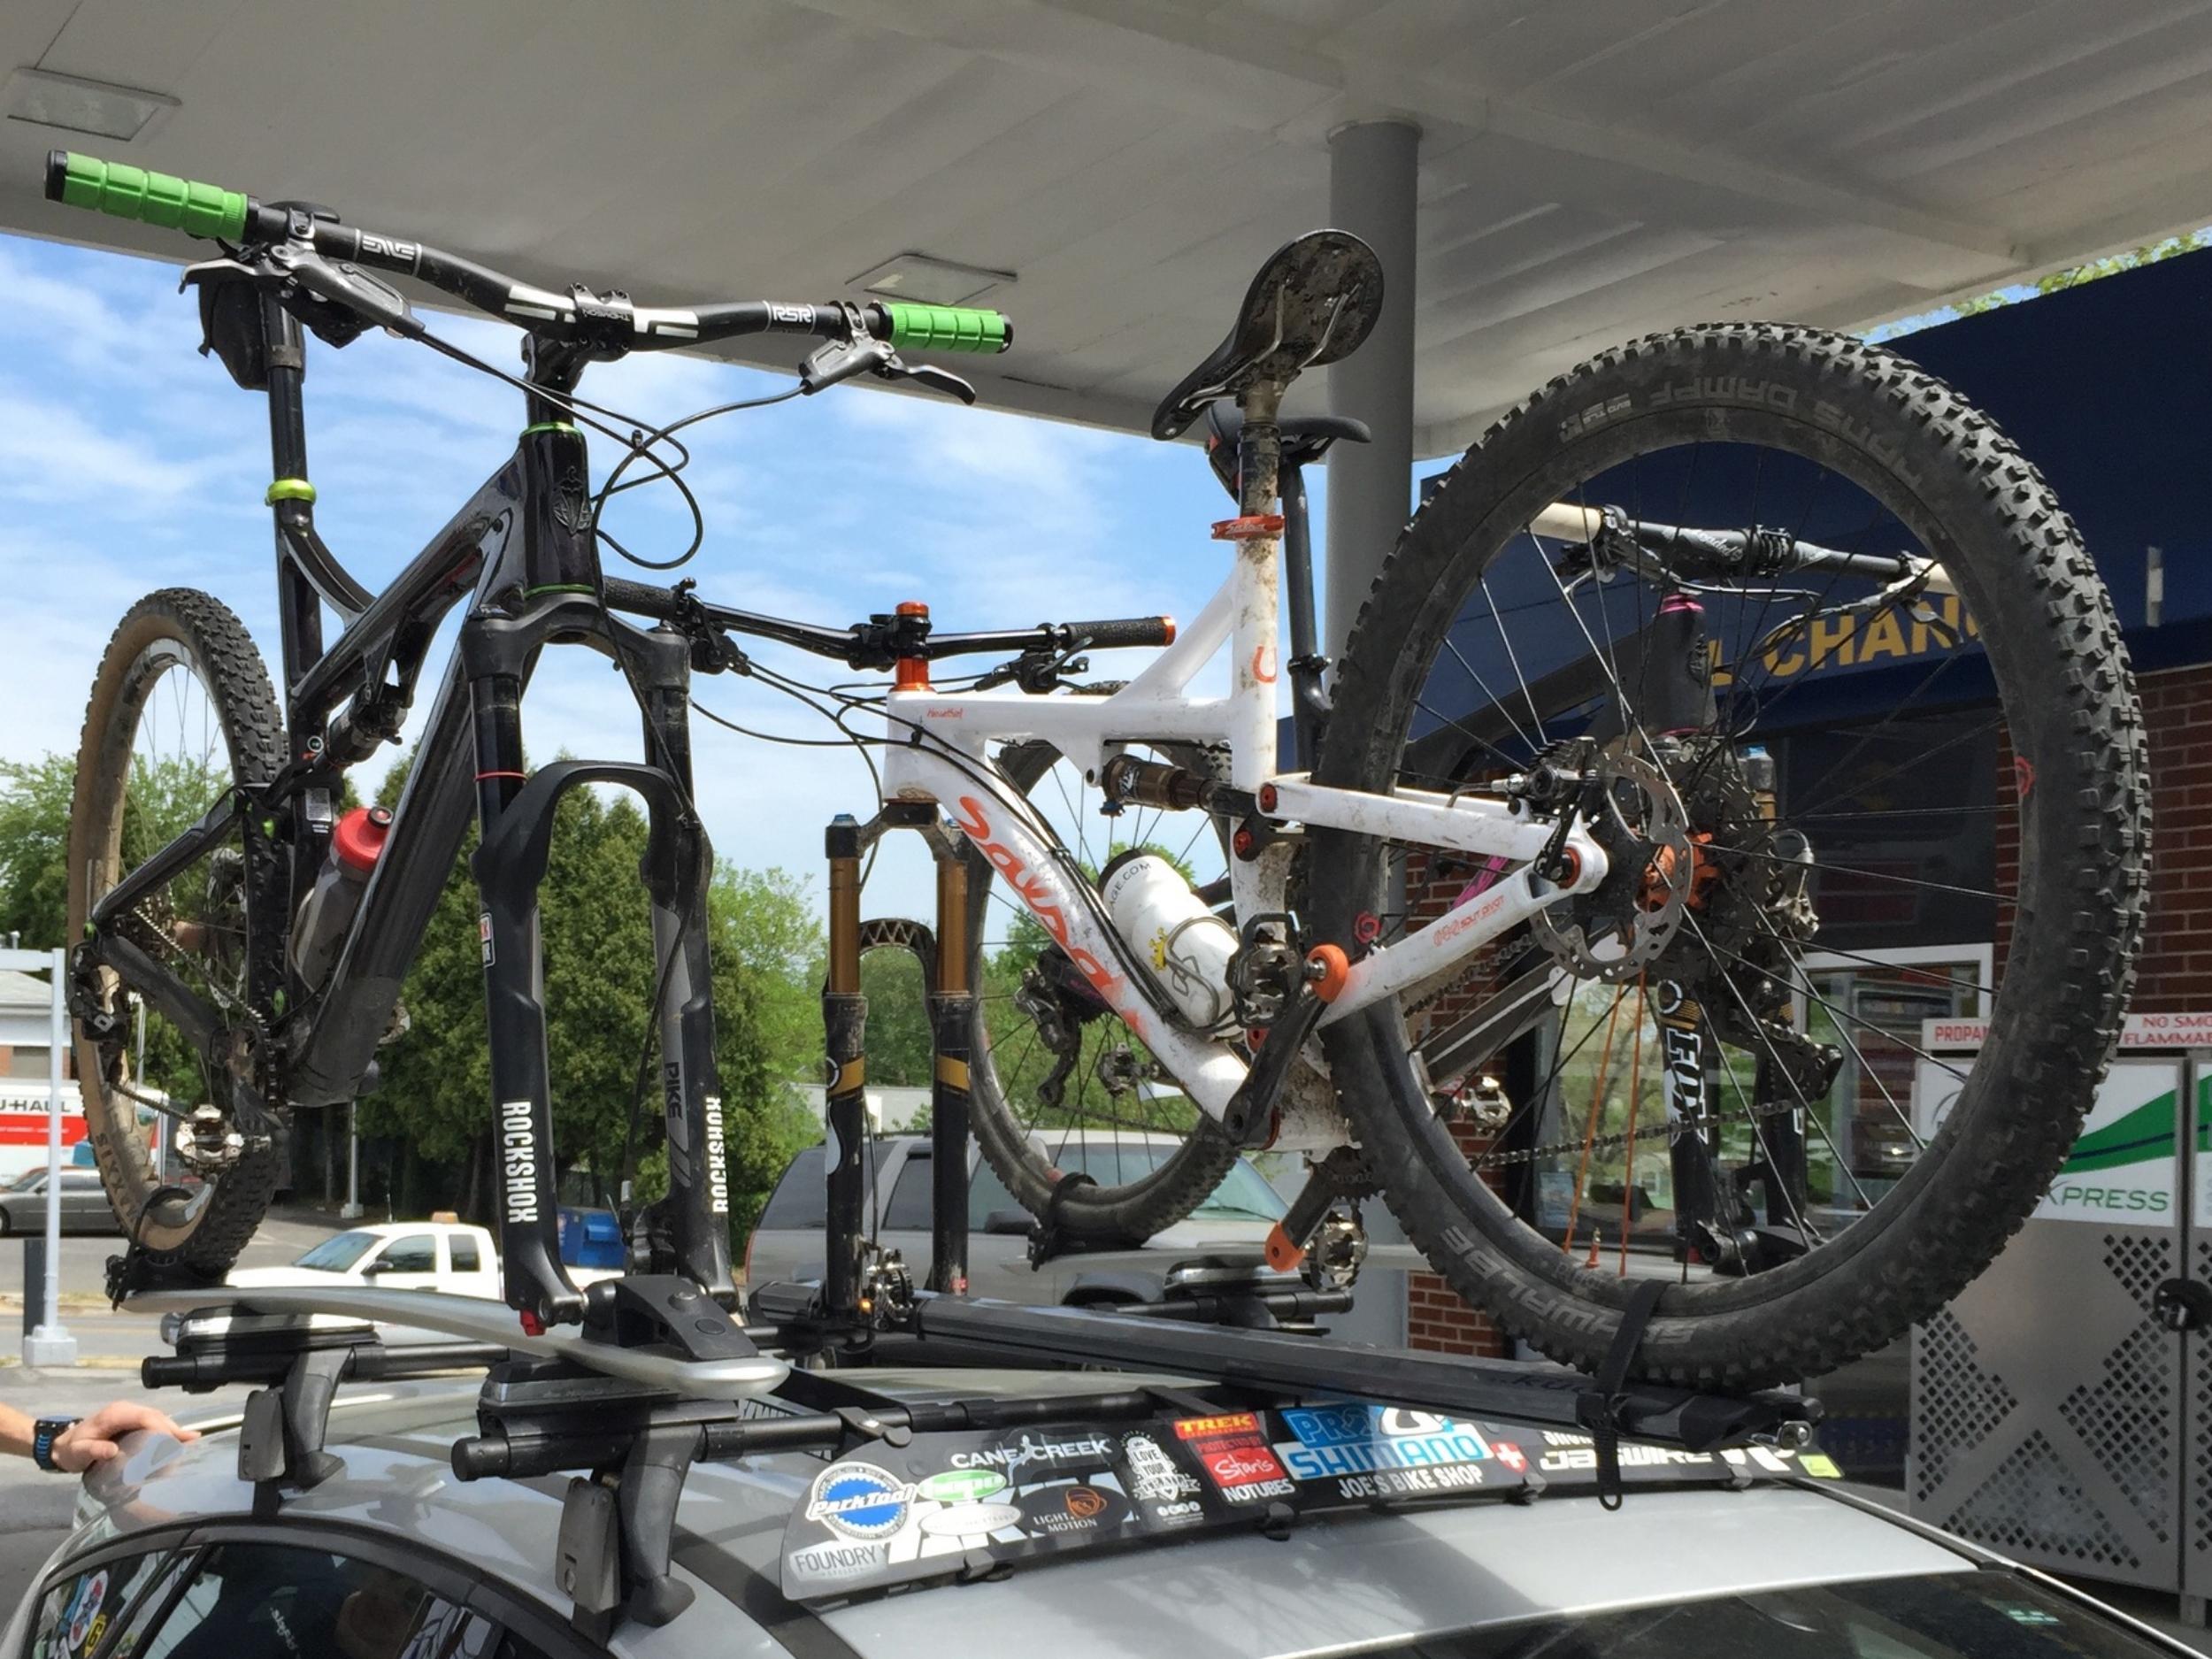 Choosing a Bike Like a Pro - Pursue the Podium